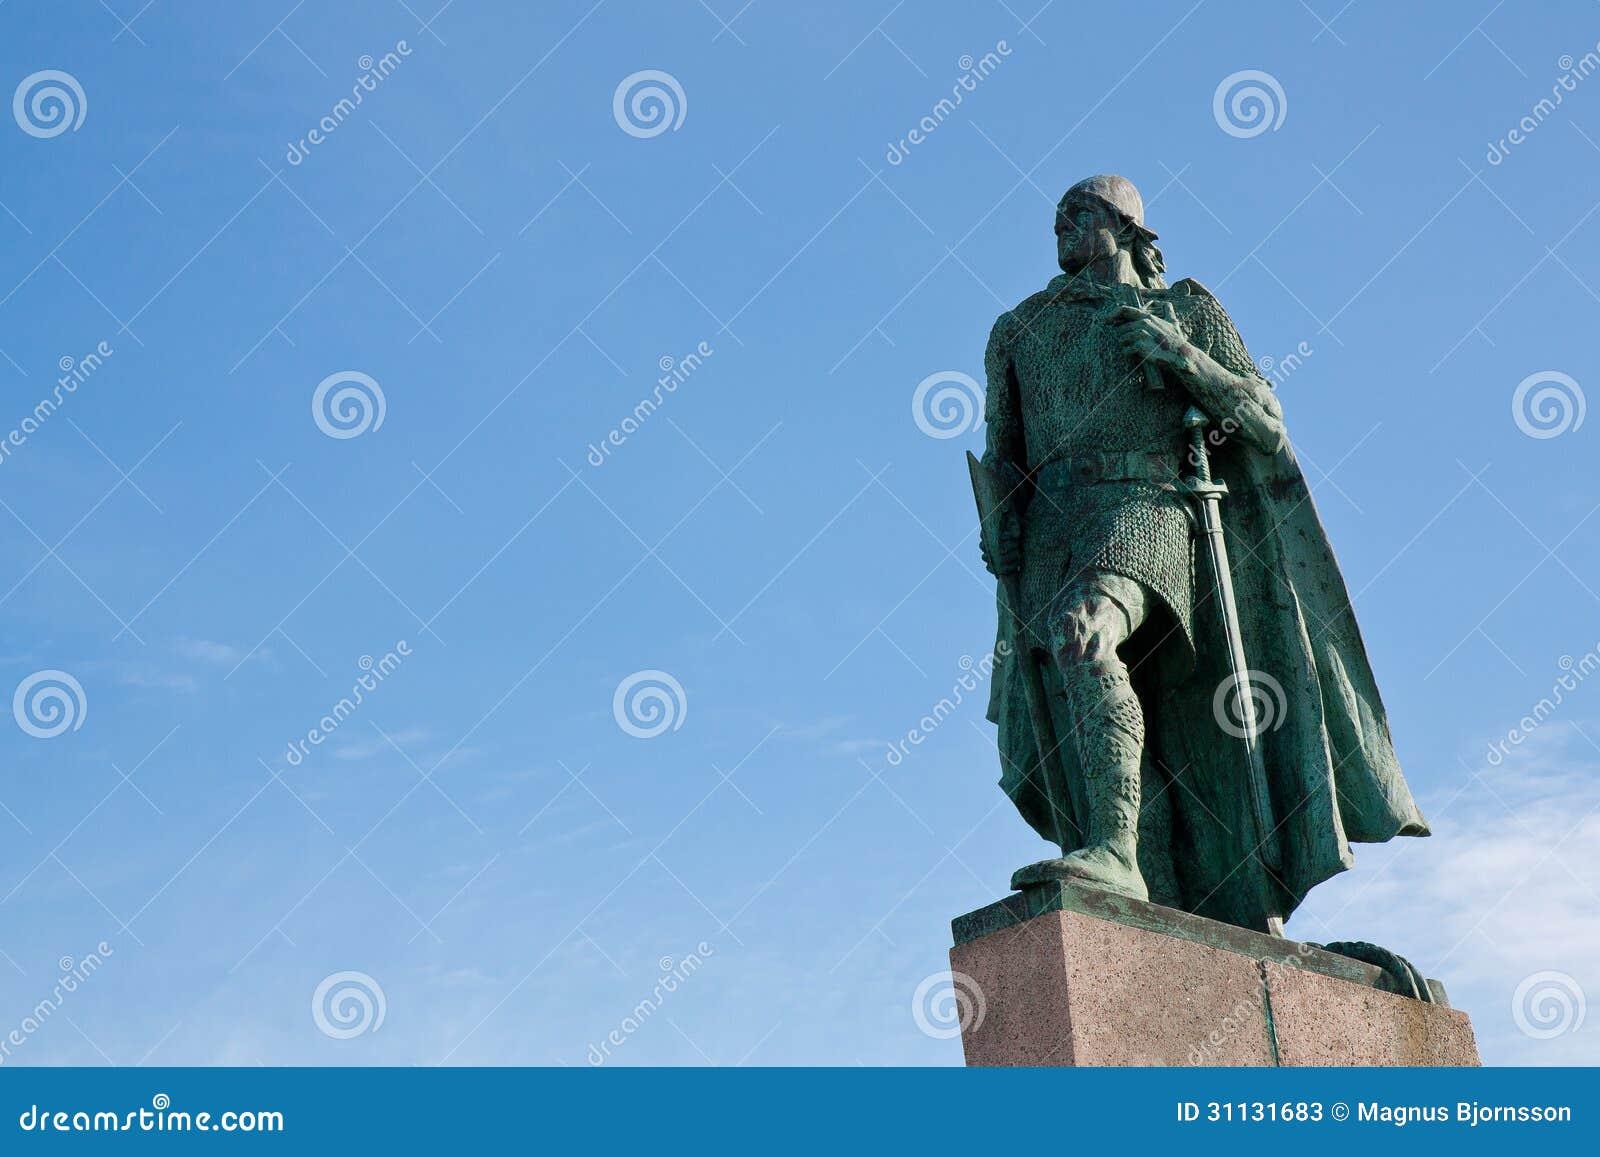 Statue of Leif Ericson   Leif Eriksson